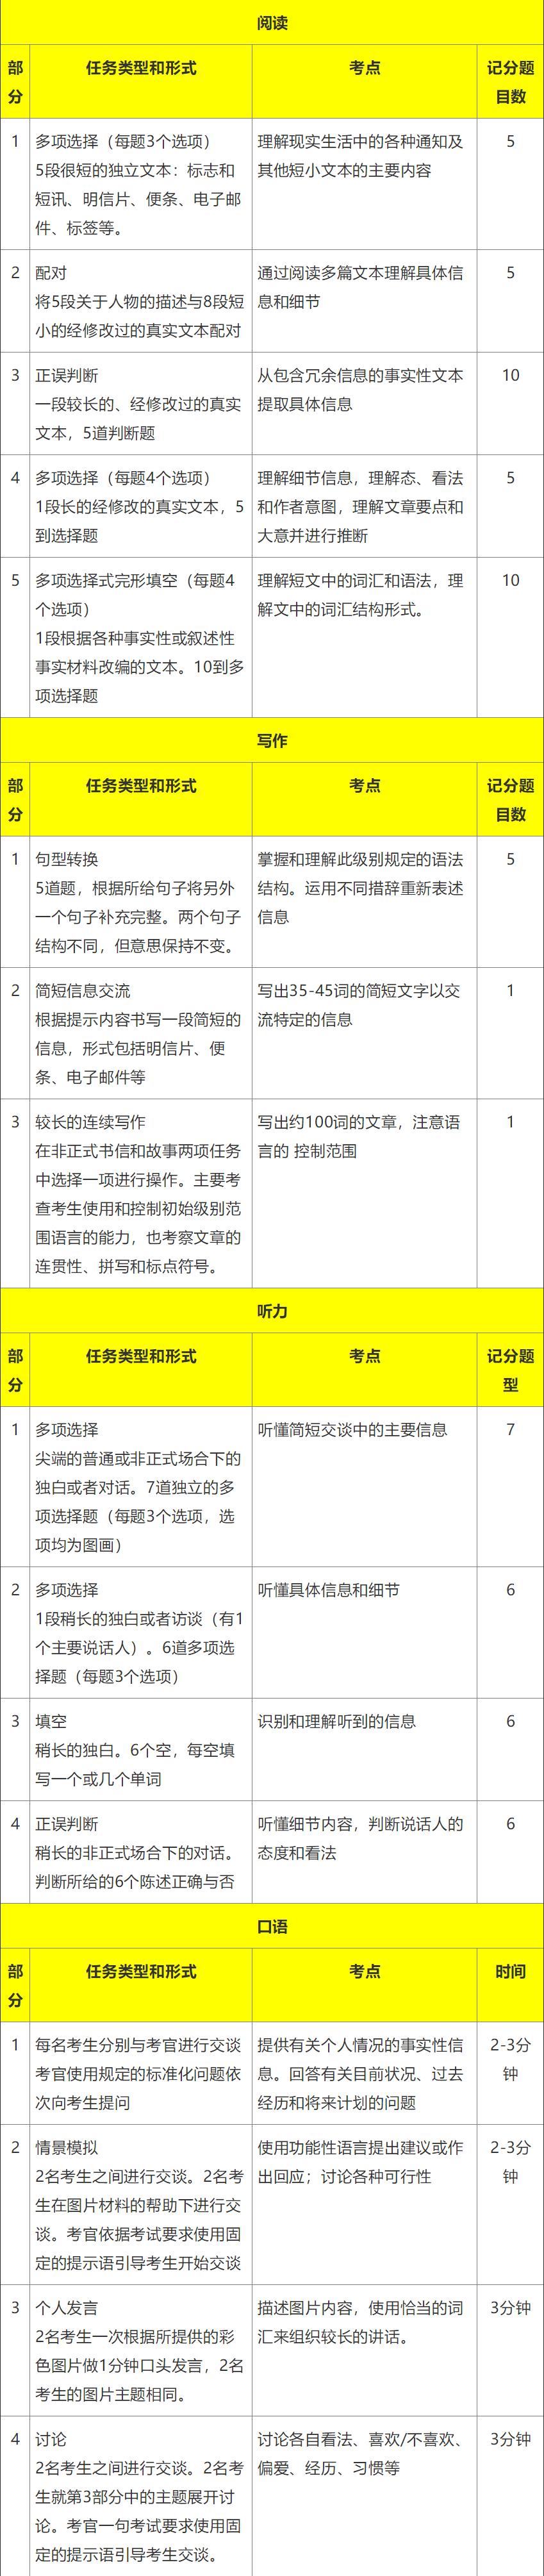 pet考试分值 米粒妈学院pet考试分值分布